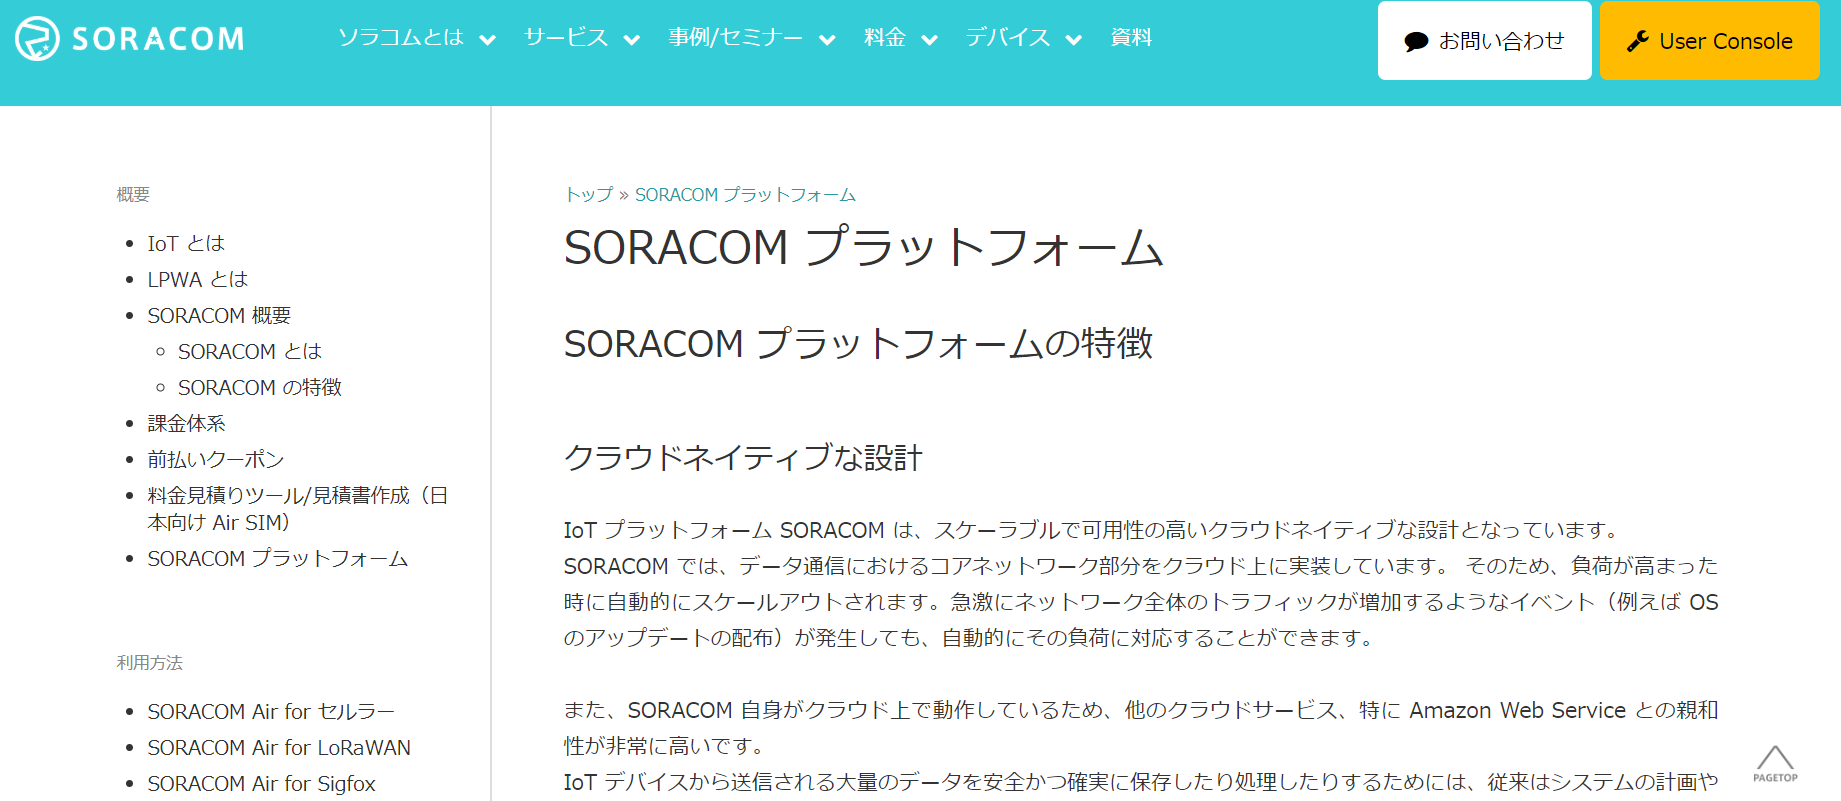 SORACOM公式Webサイト